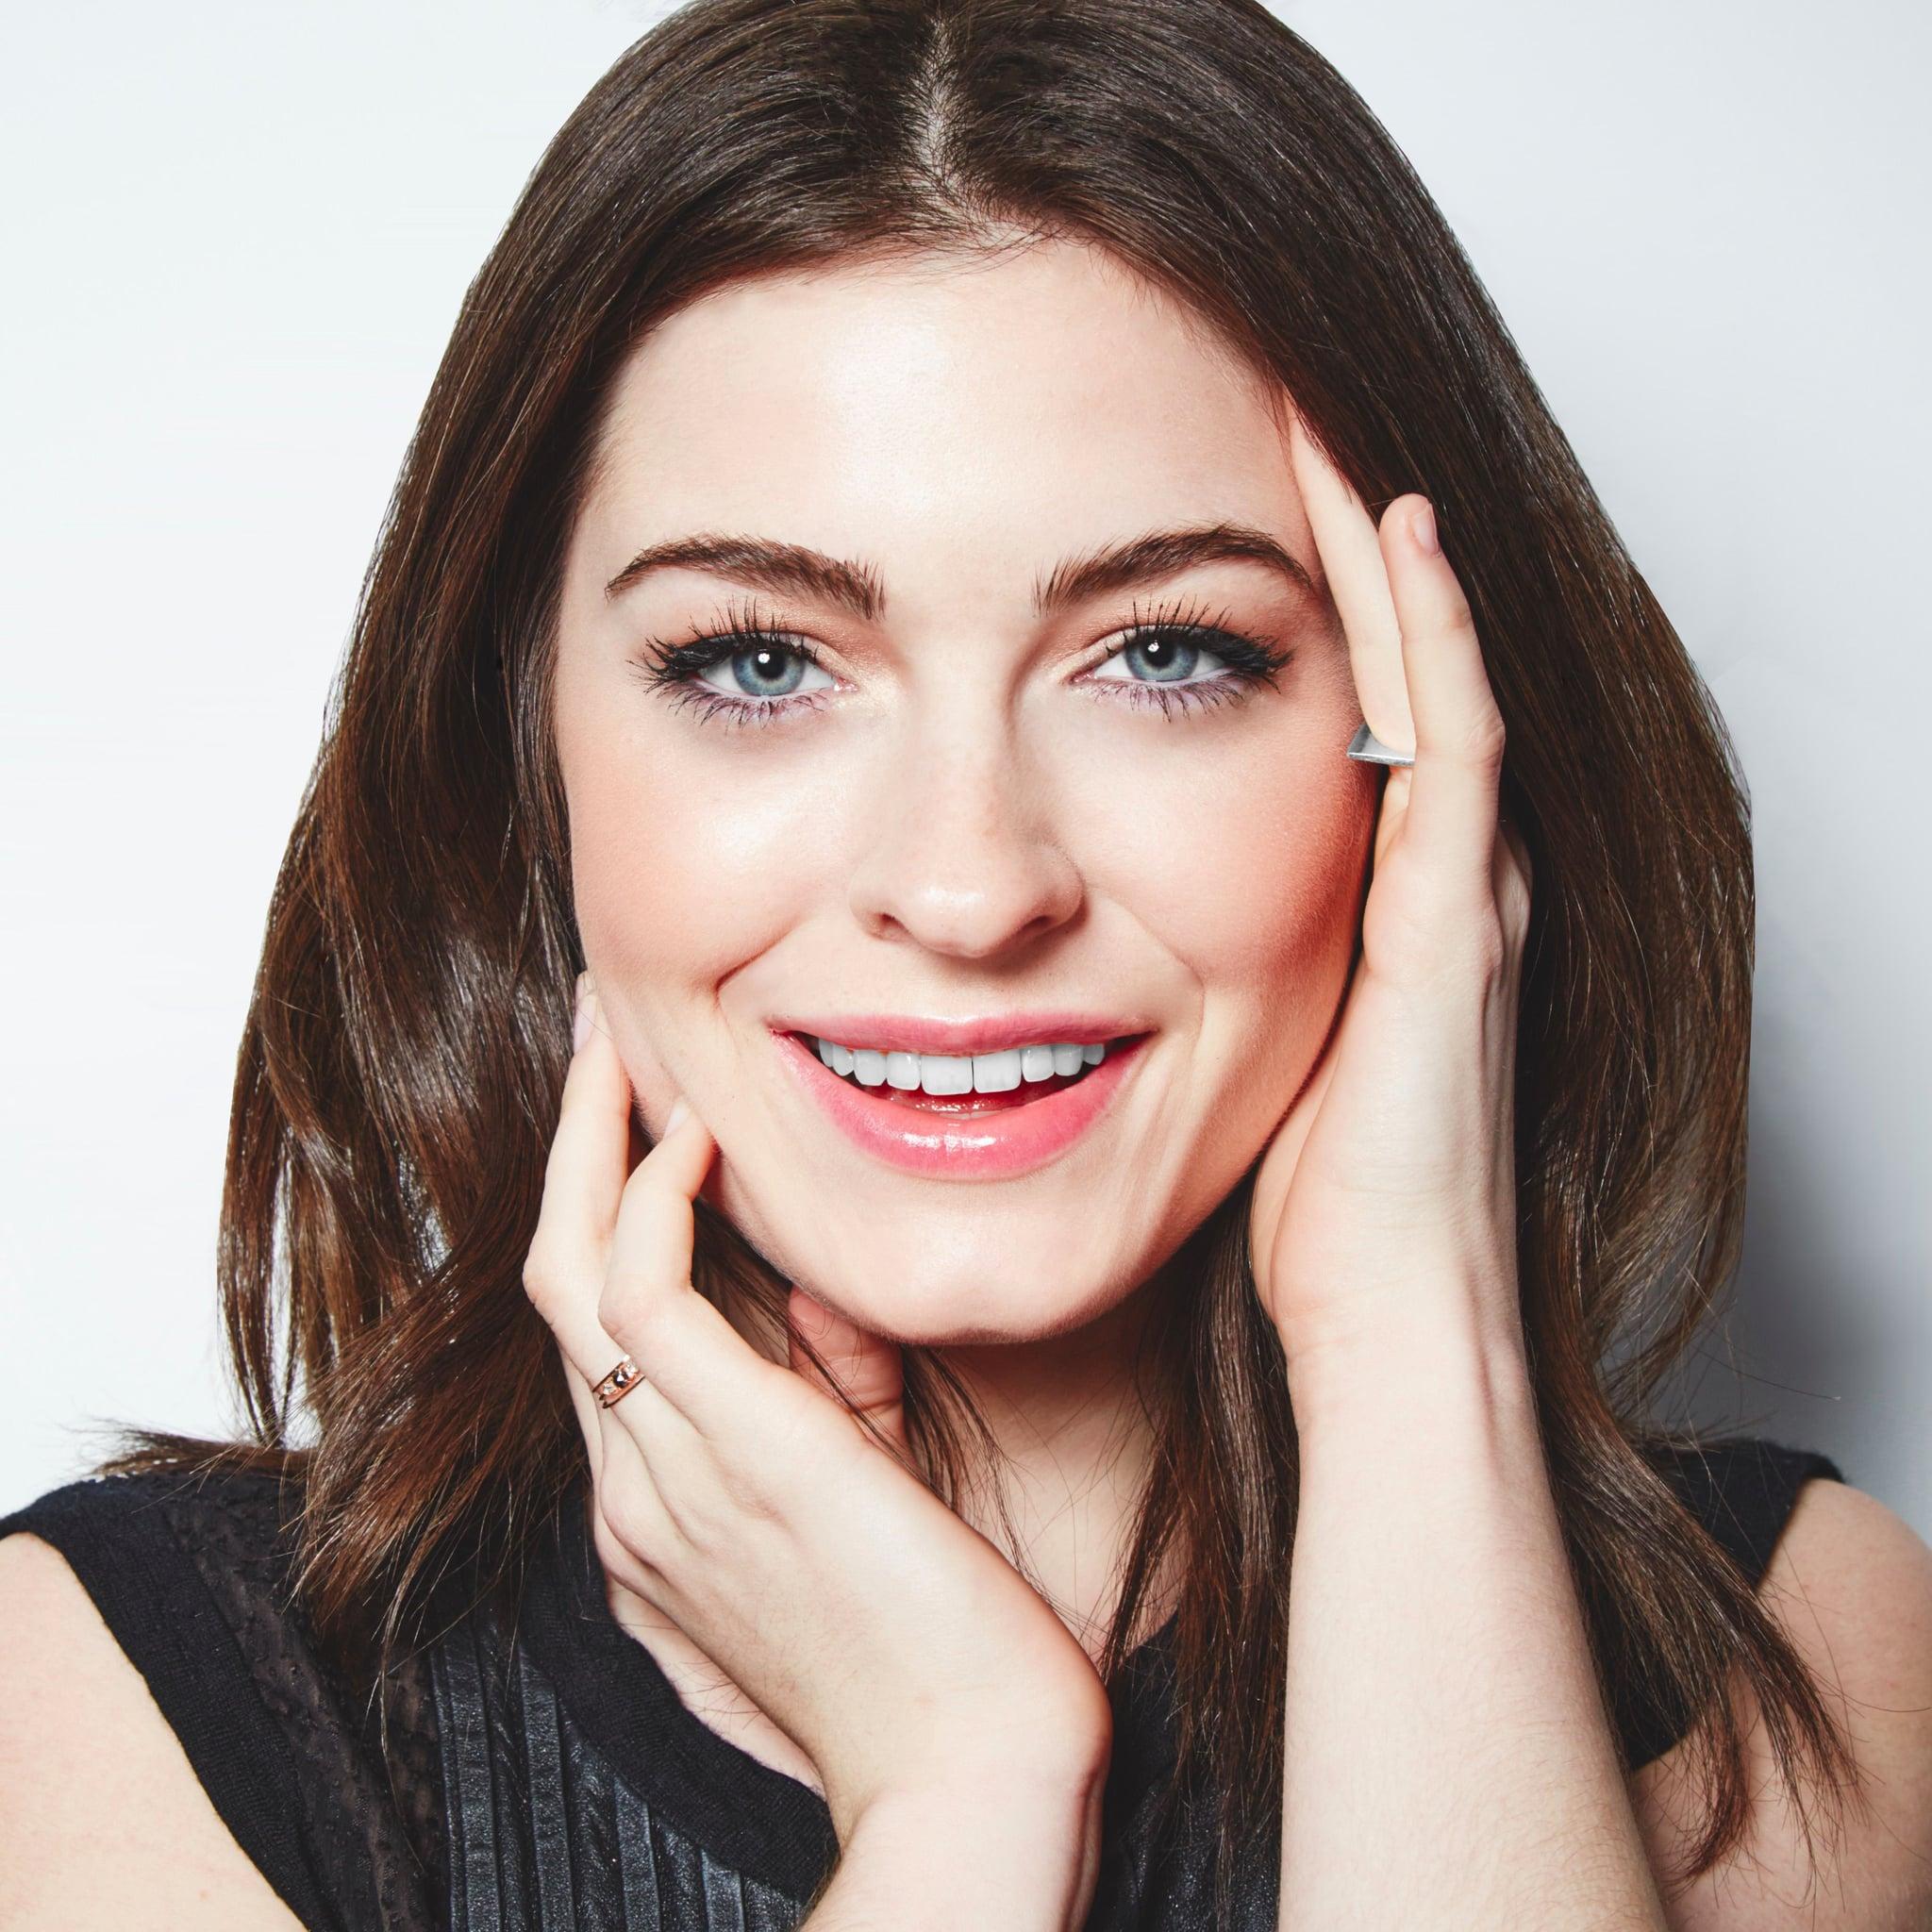 The Best Summer Foundations According To Makeup Artists Popsugar Beauty Australia